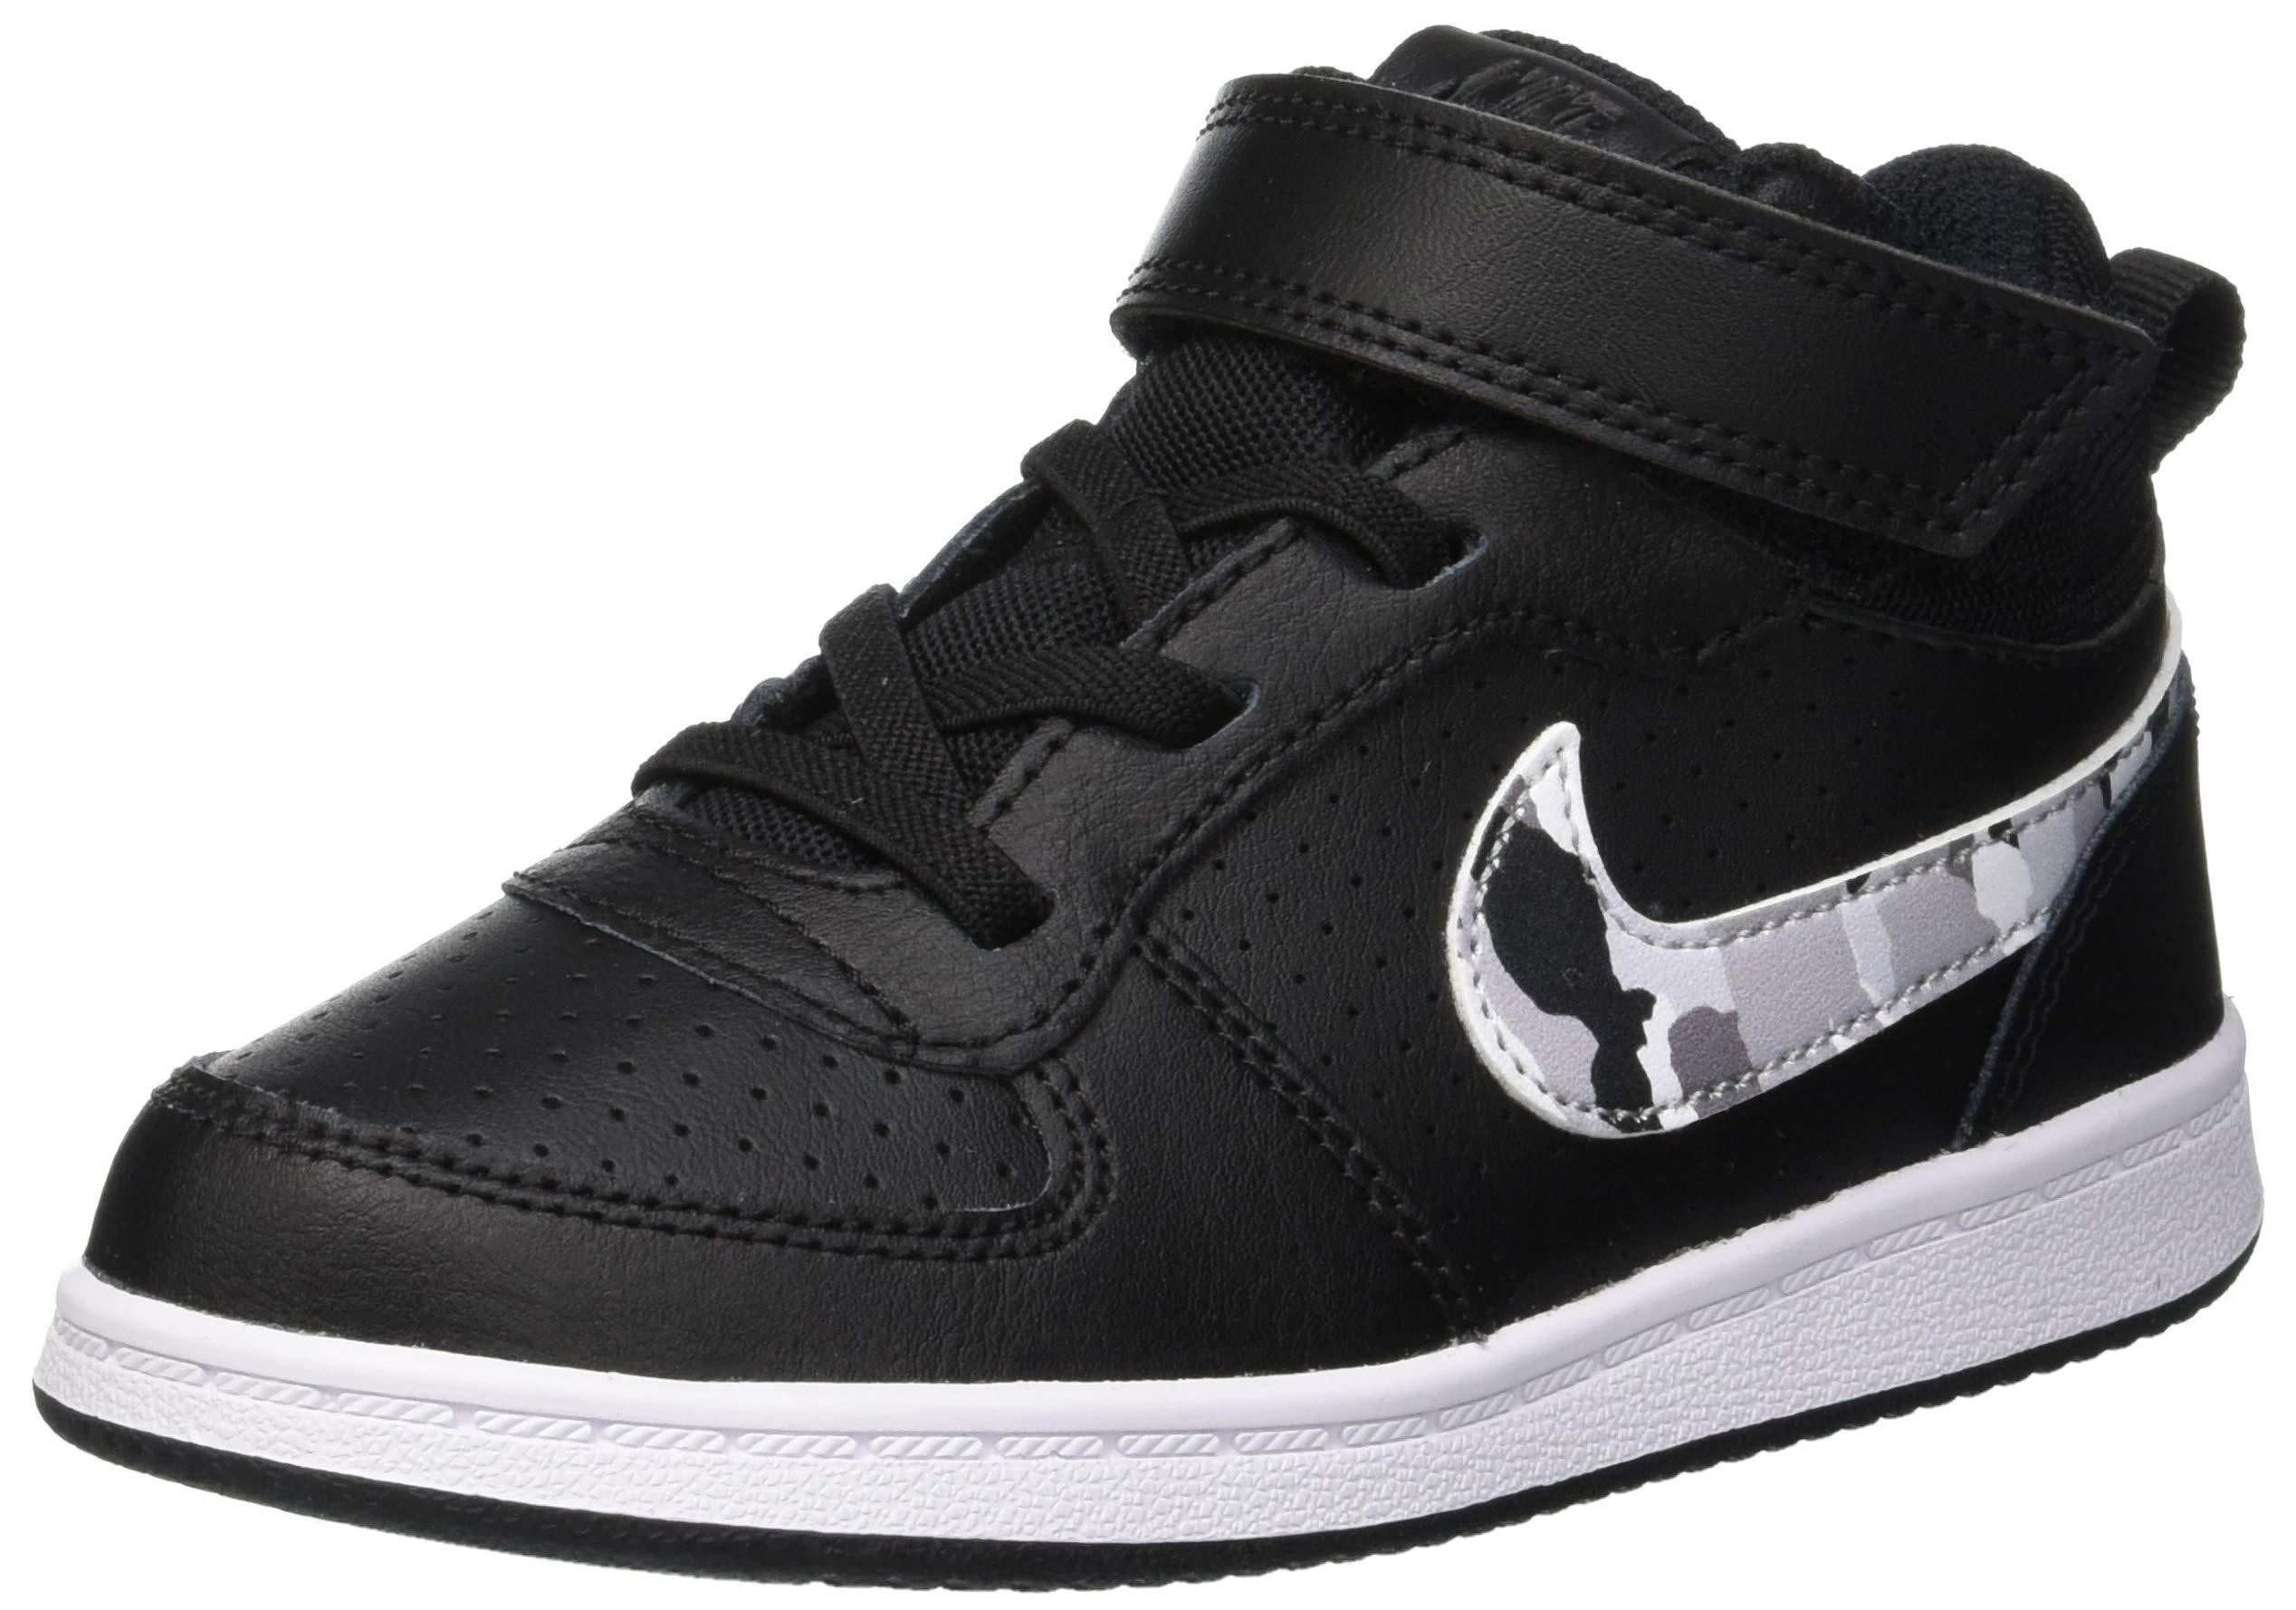 Nike Boy's Court Borough Mid (TDV) Gymnastics Shoes Child